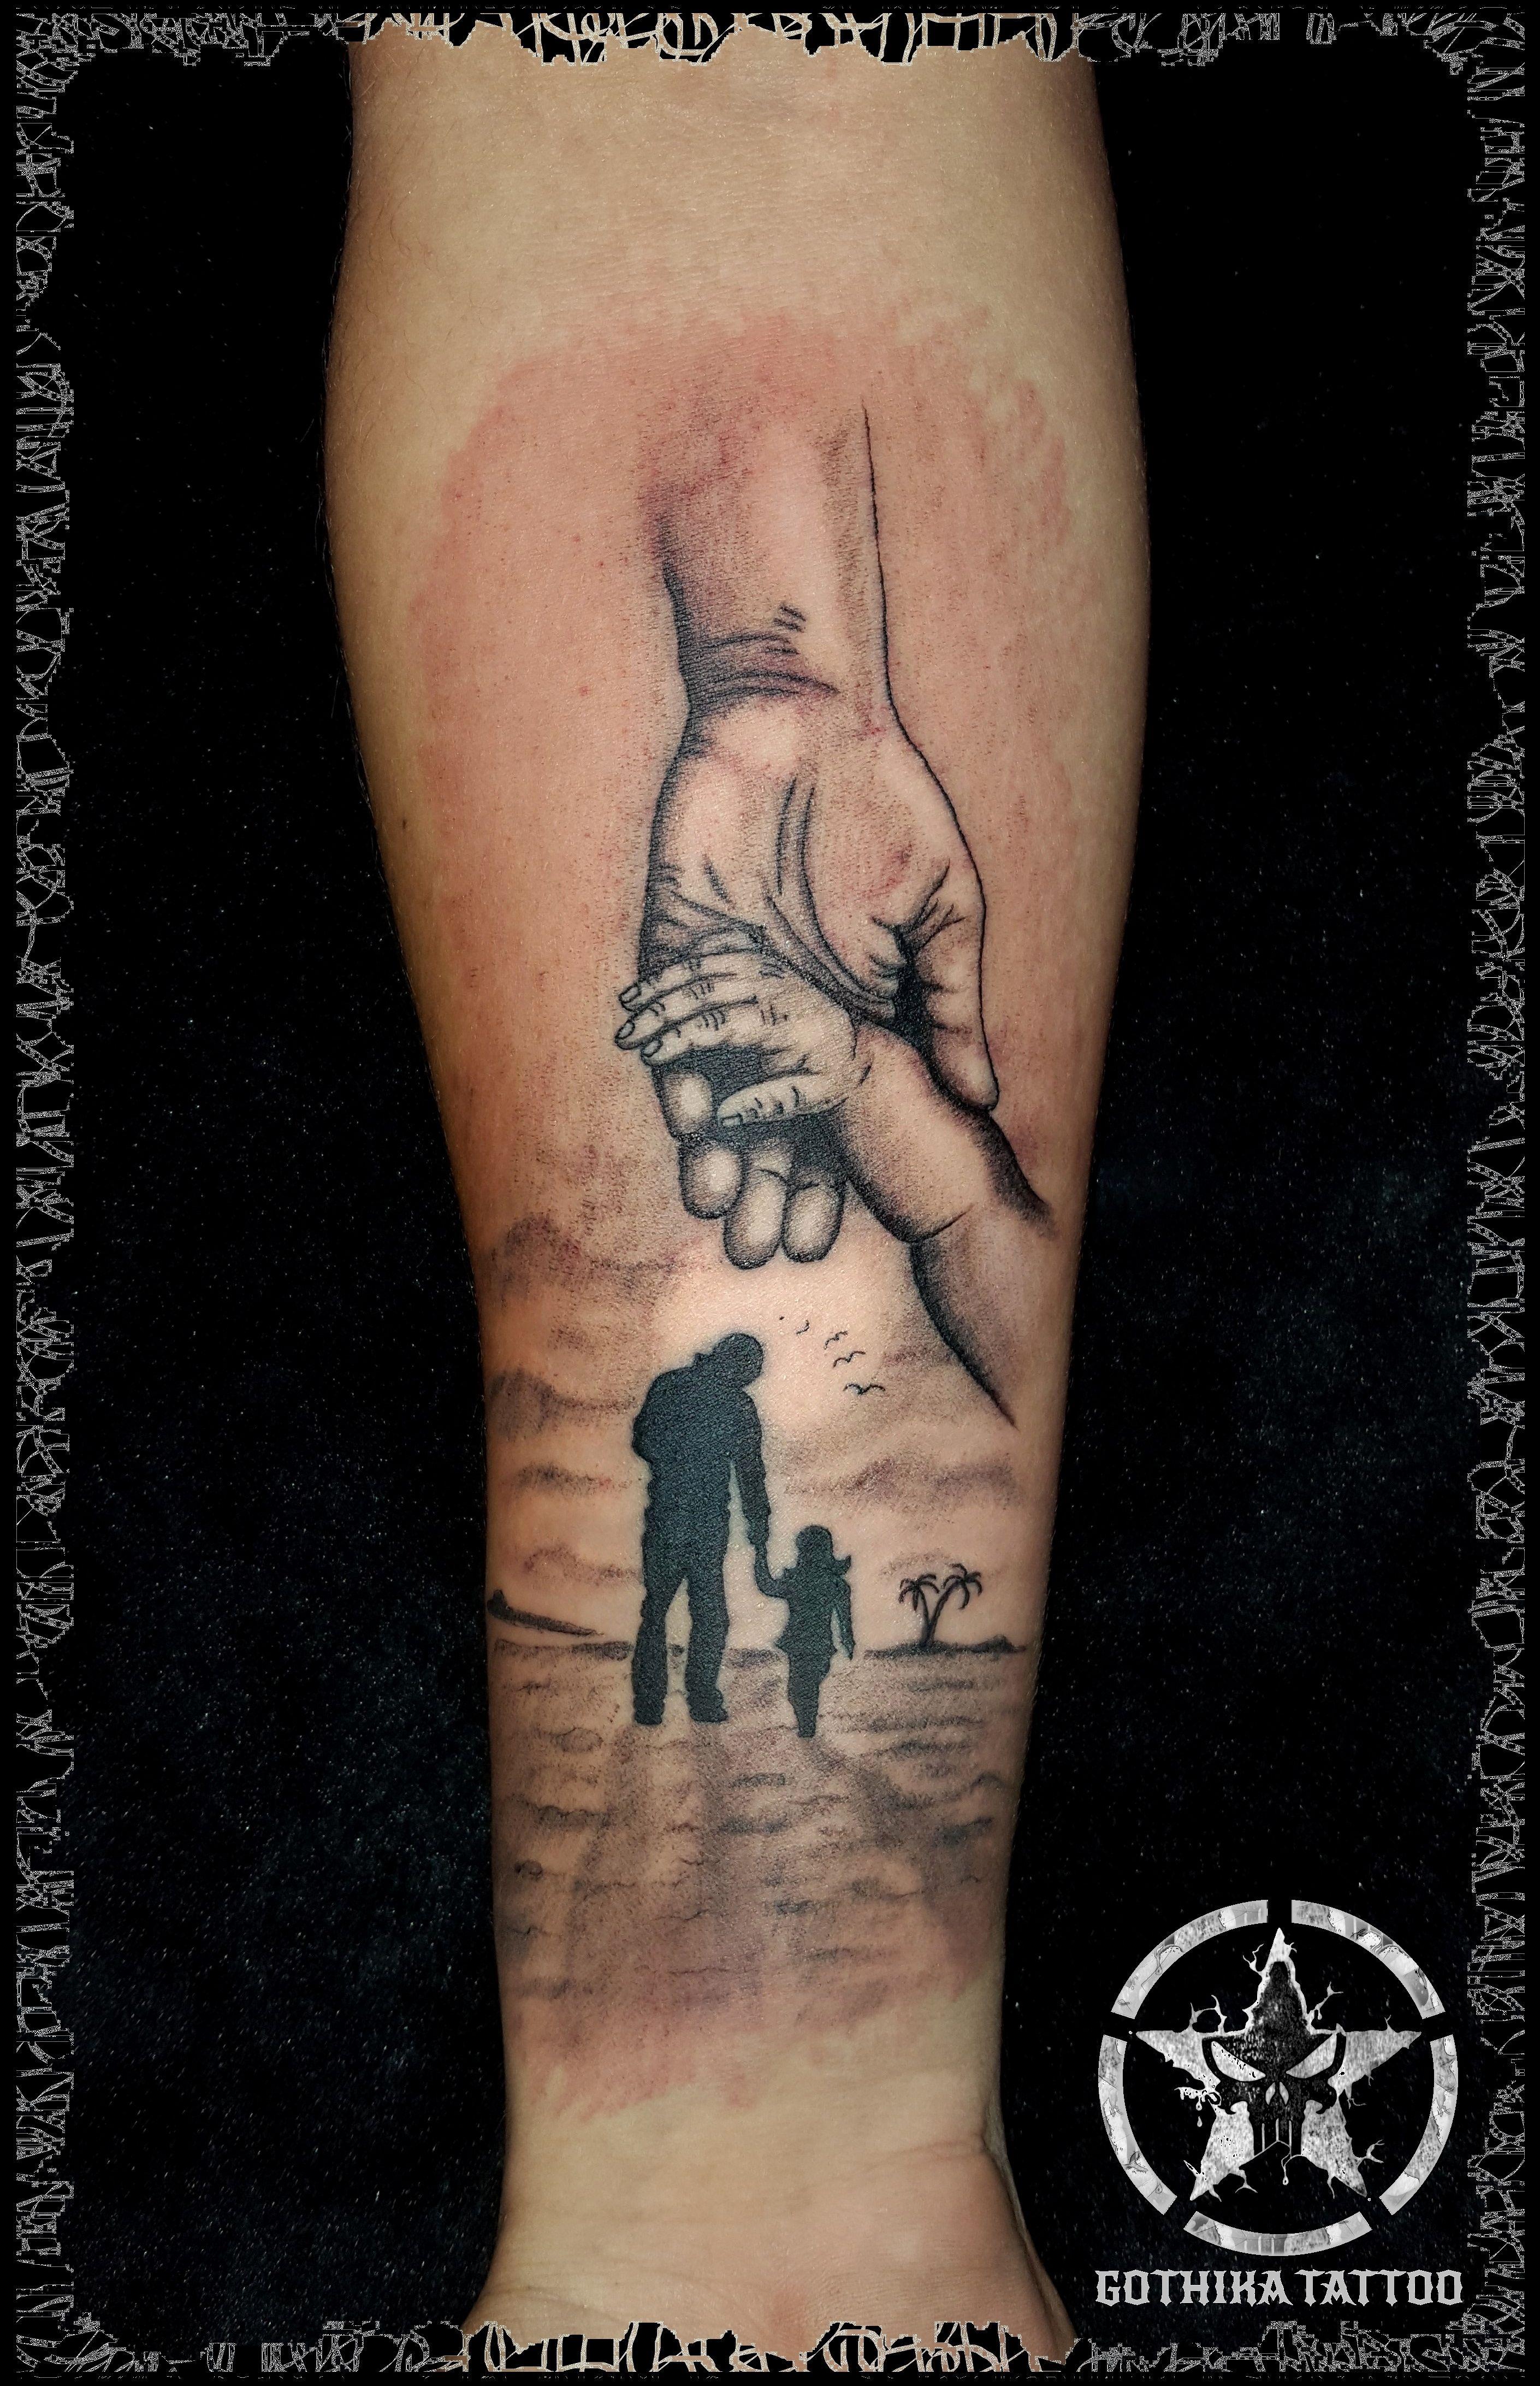 FATHER & DAUGHTER TATTOO Tatuajes conmemorativos